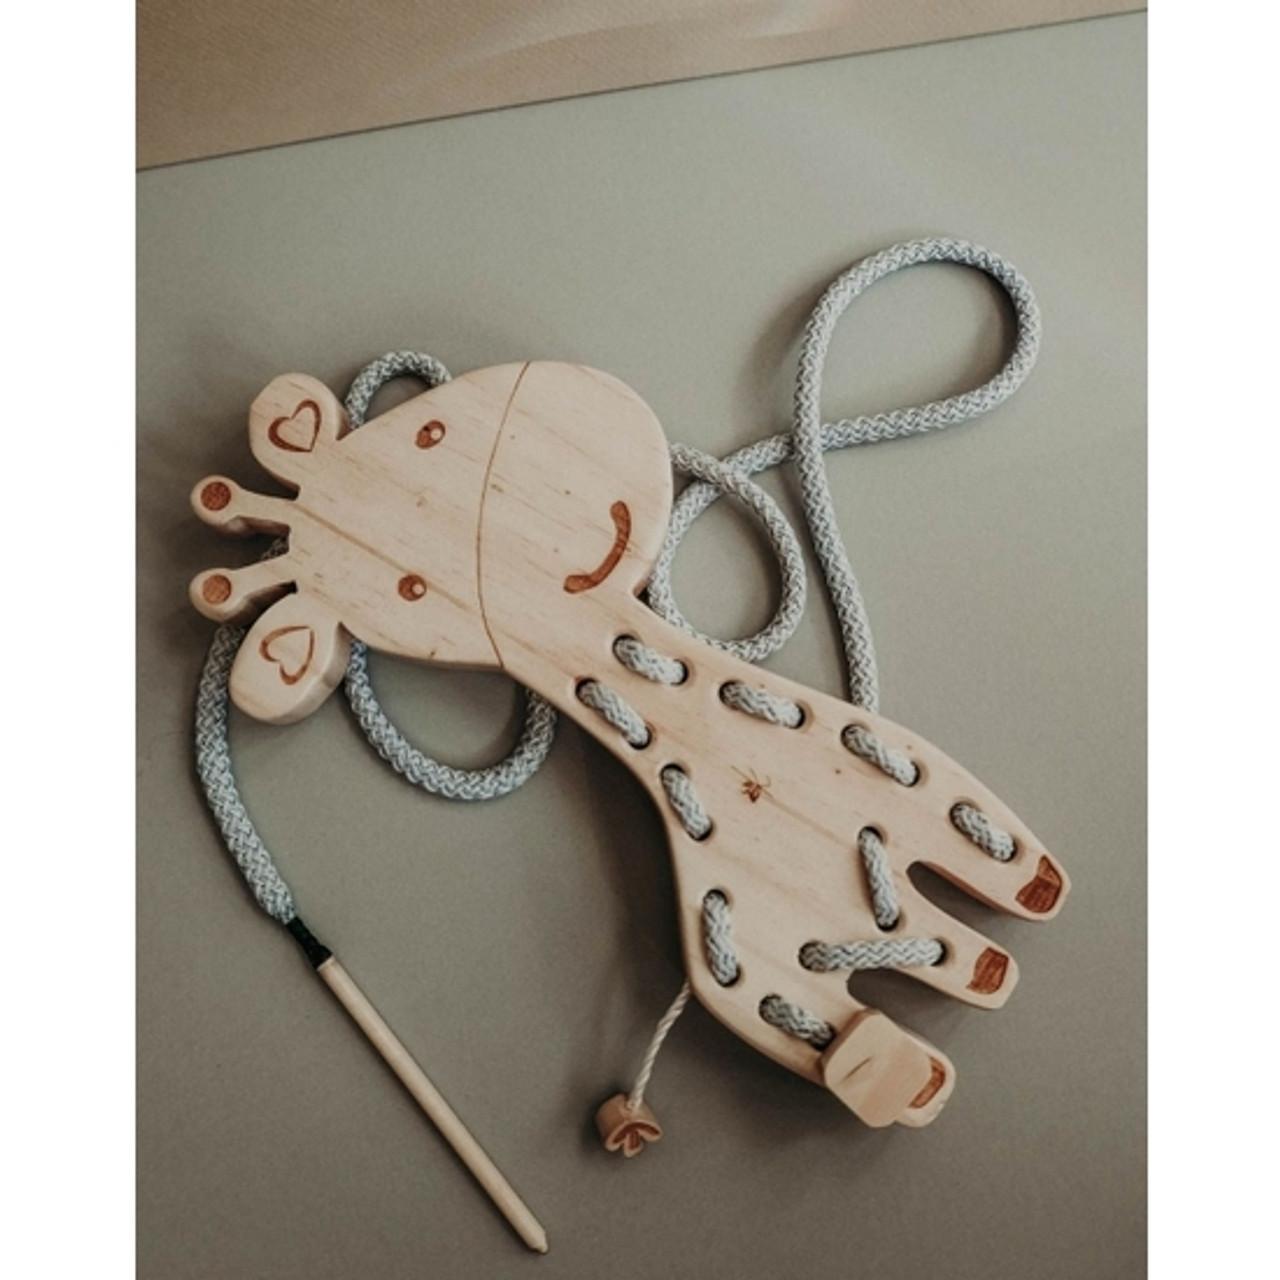 Wooden Giraffe Lacing Toy